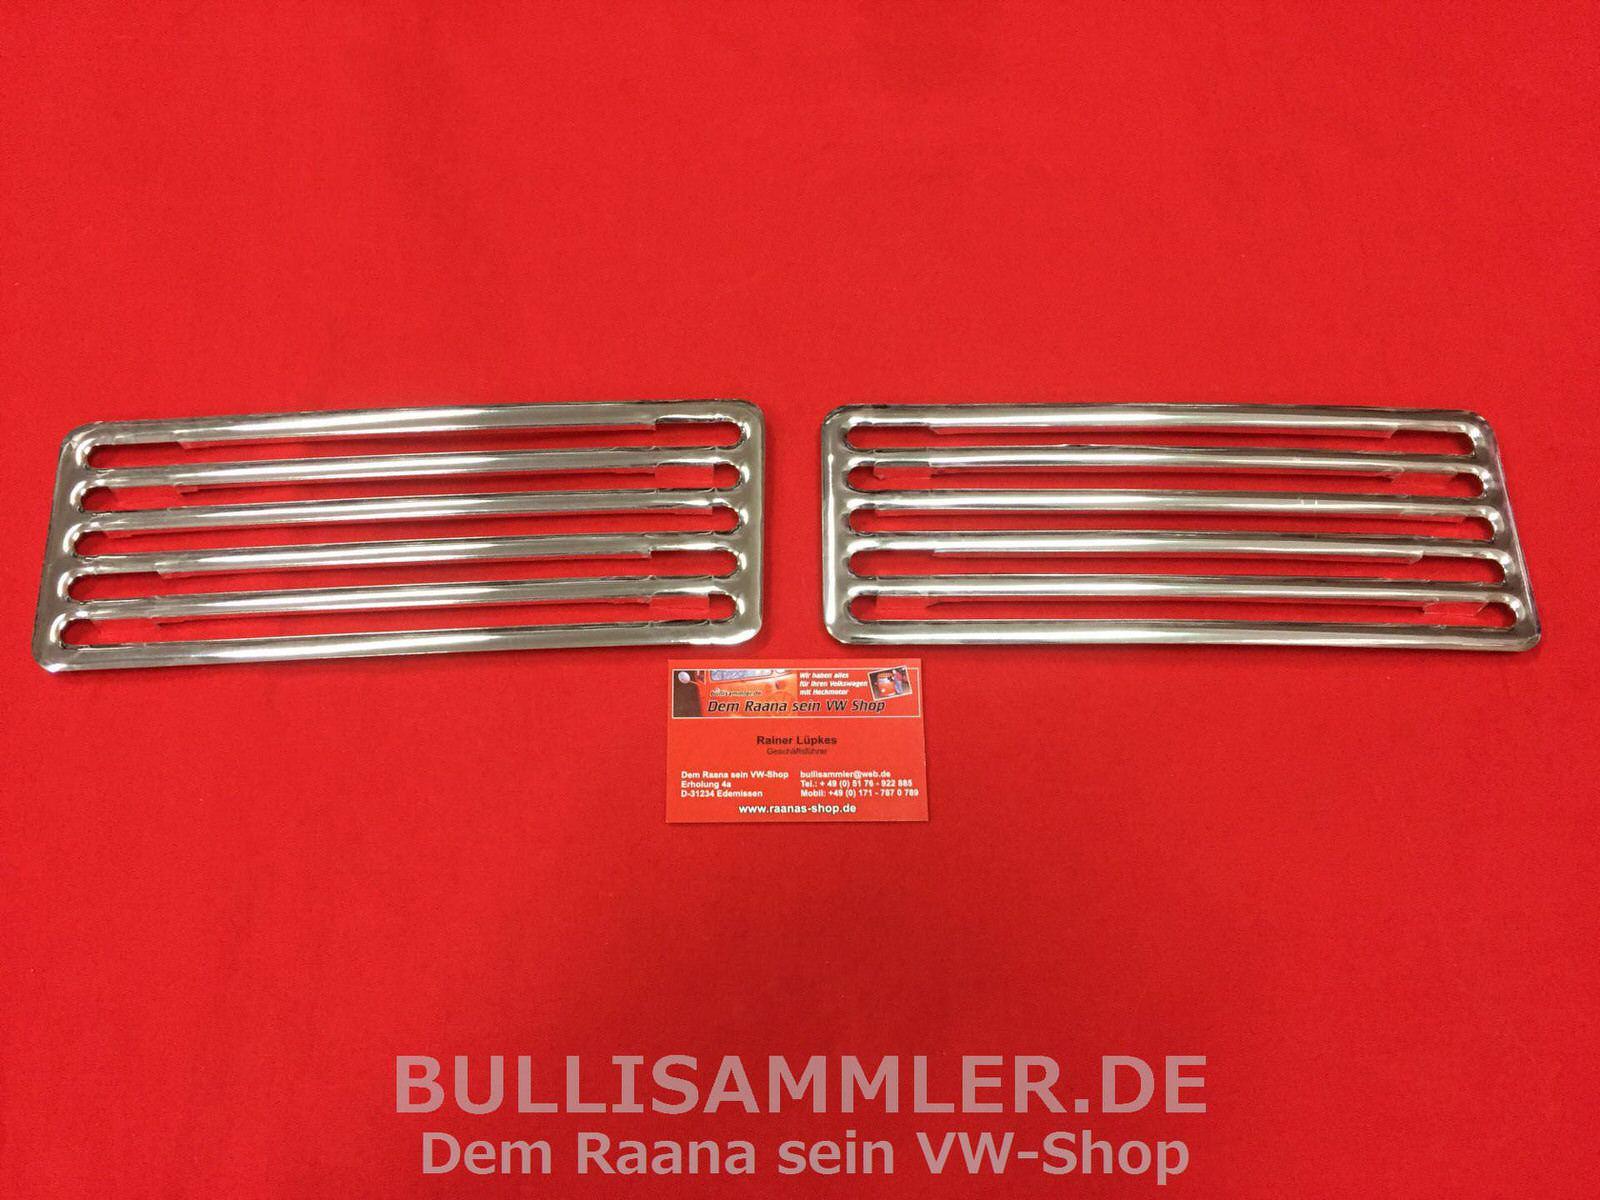 Ziergitter chrom für VW Käfer 1200 1302   NEU